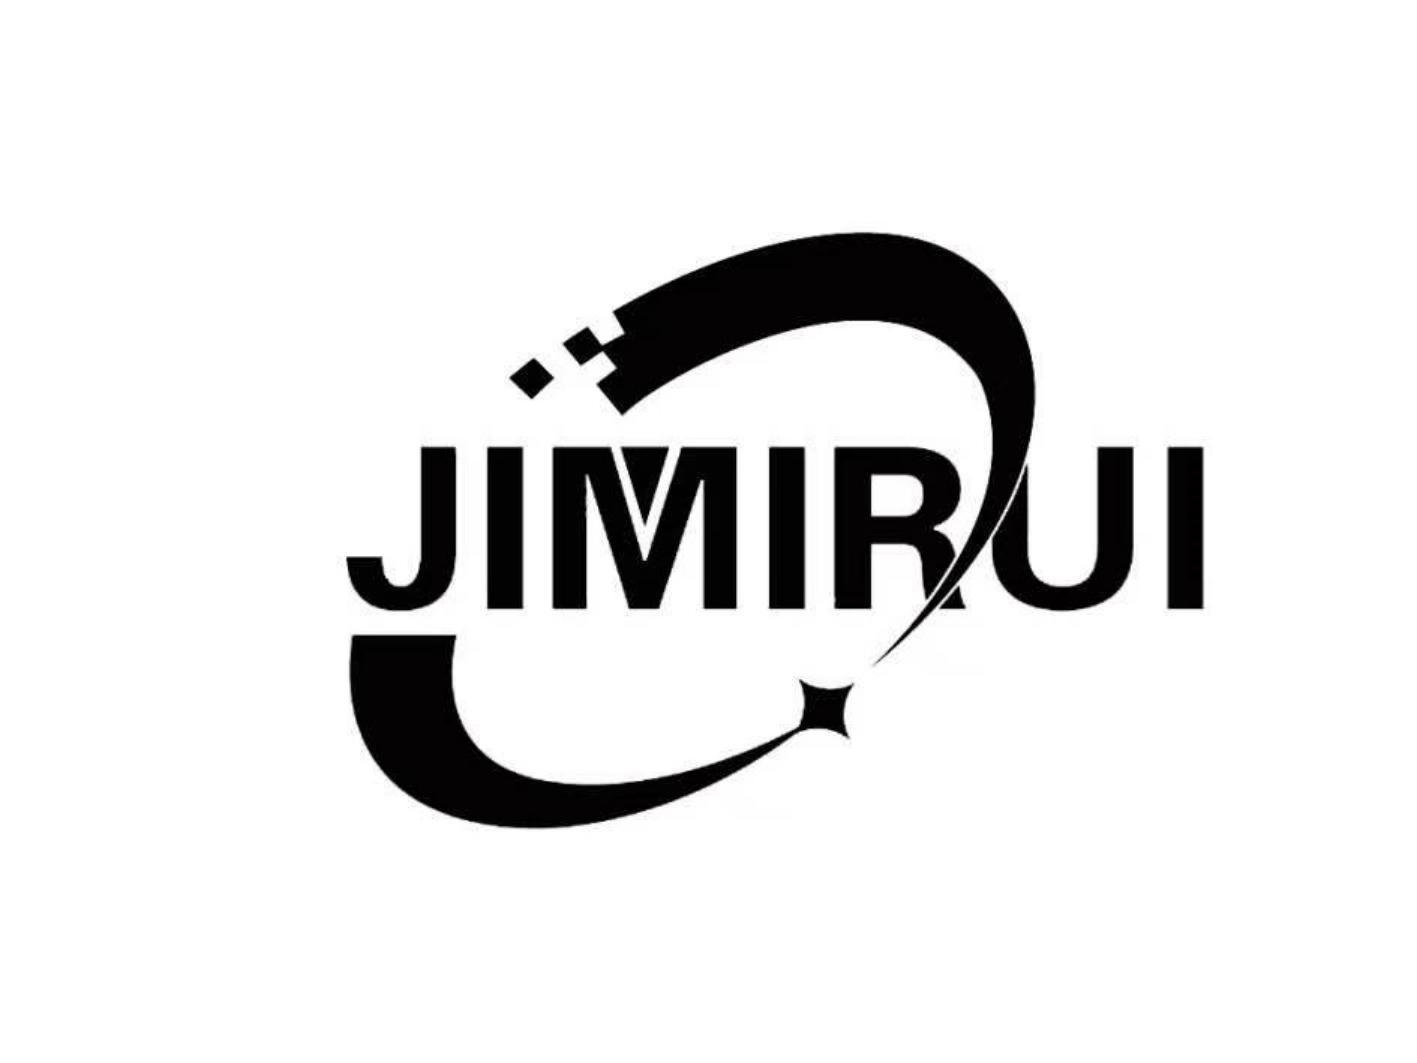 Bildmarke: JIMIRUI